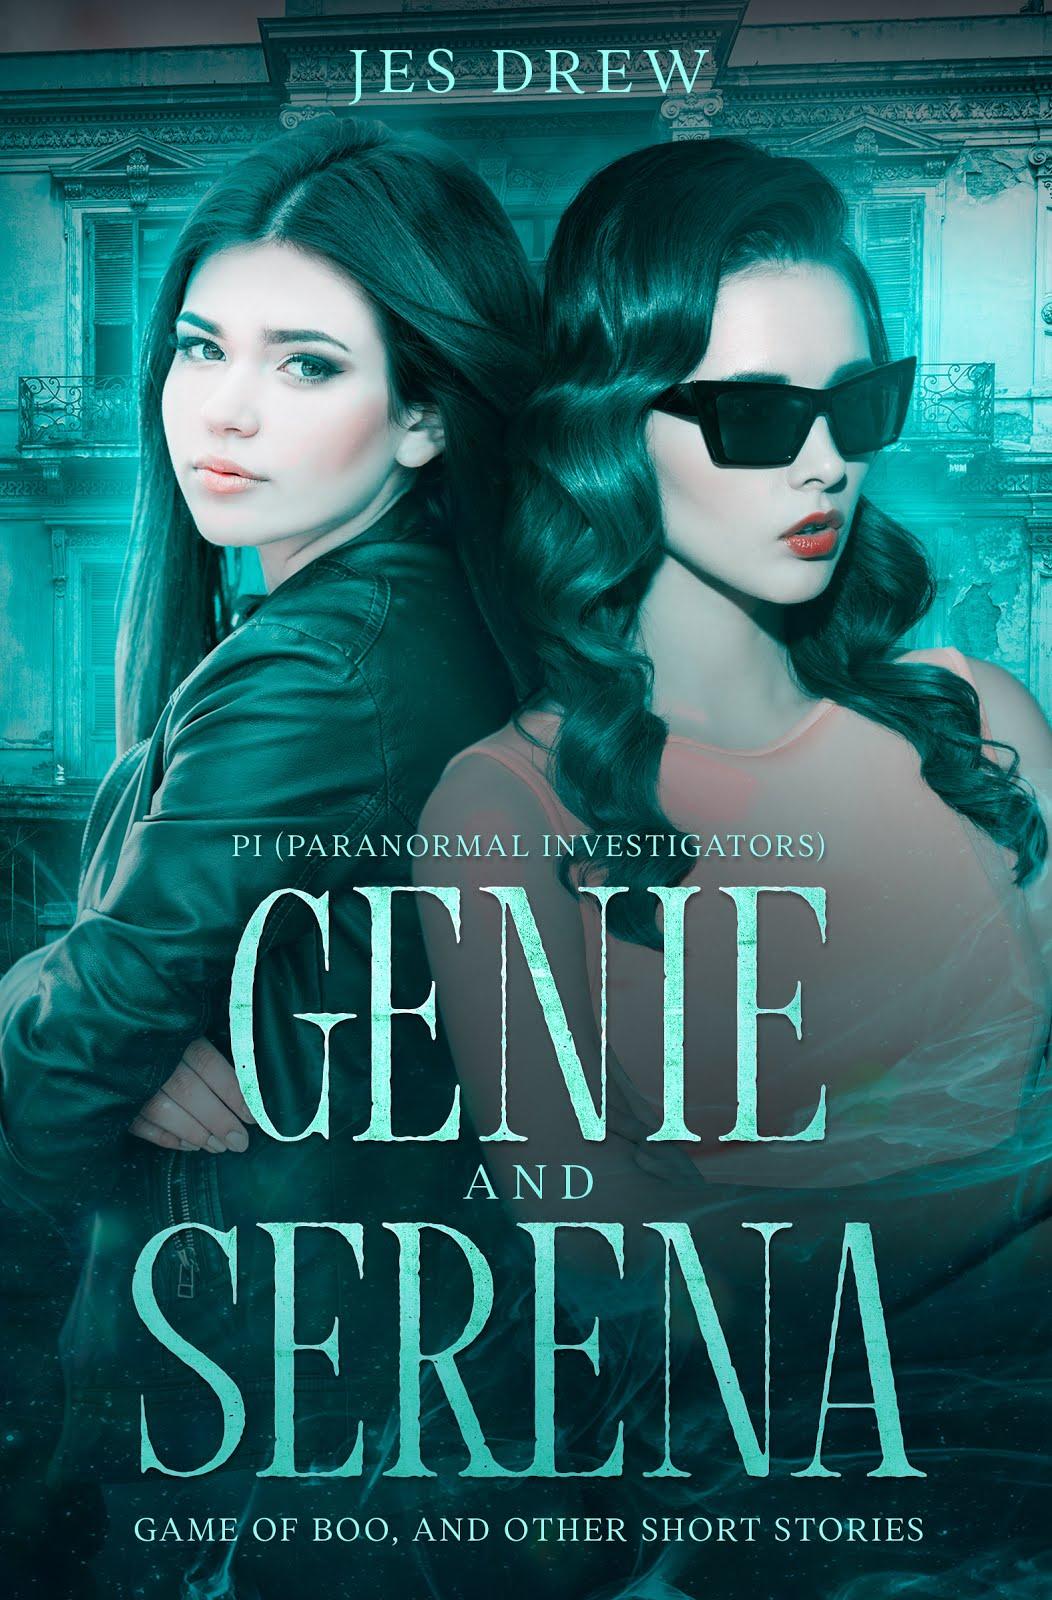 Genie and Serena